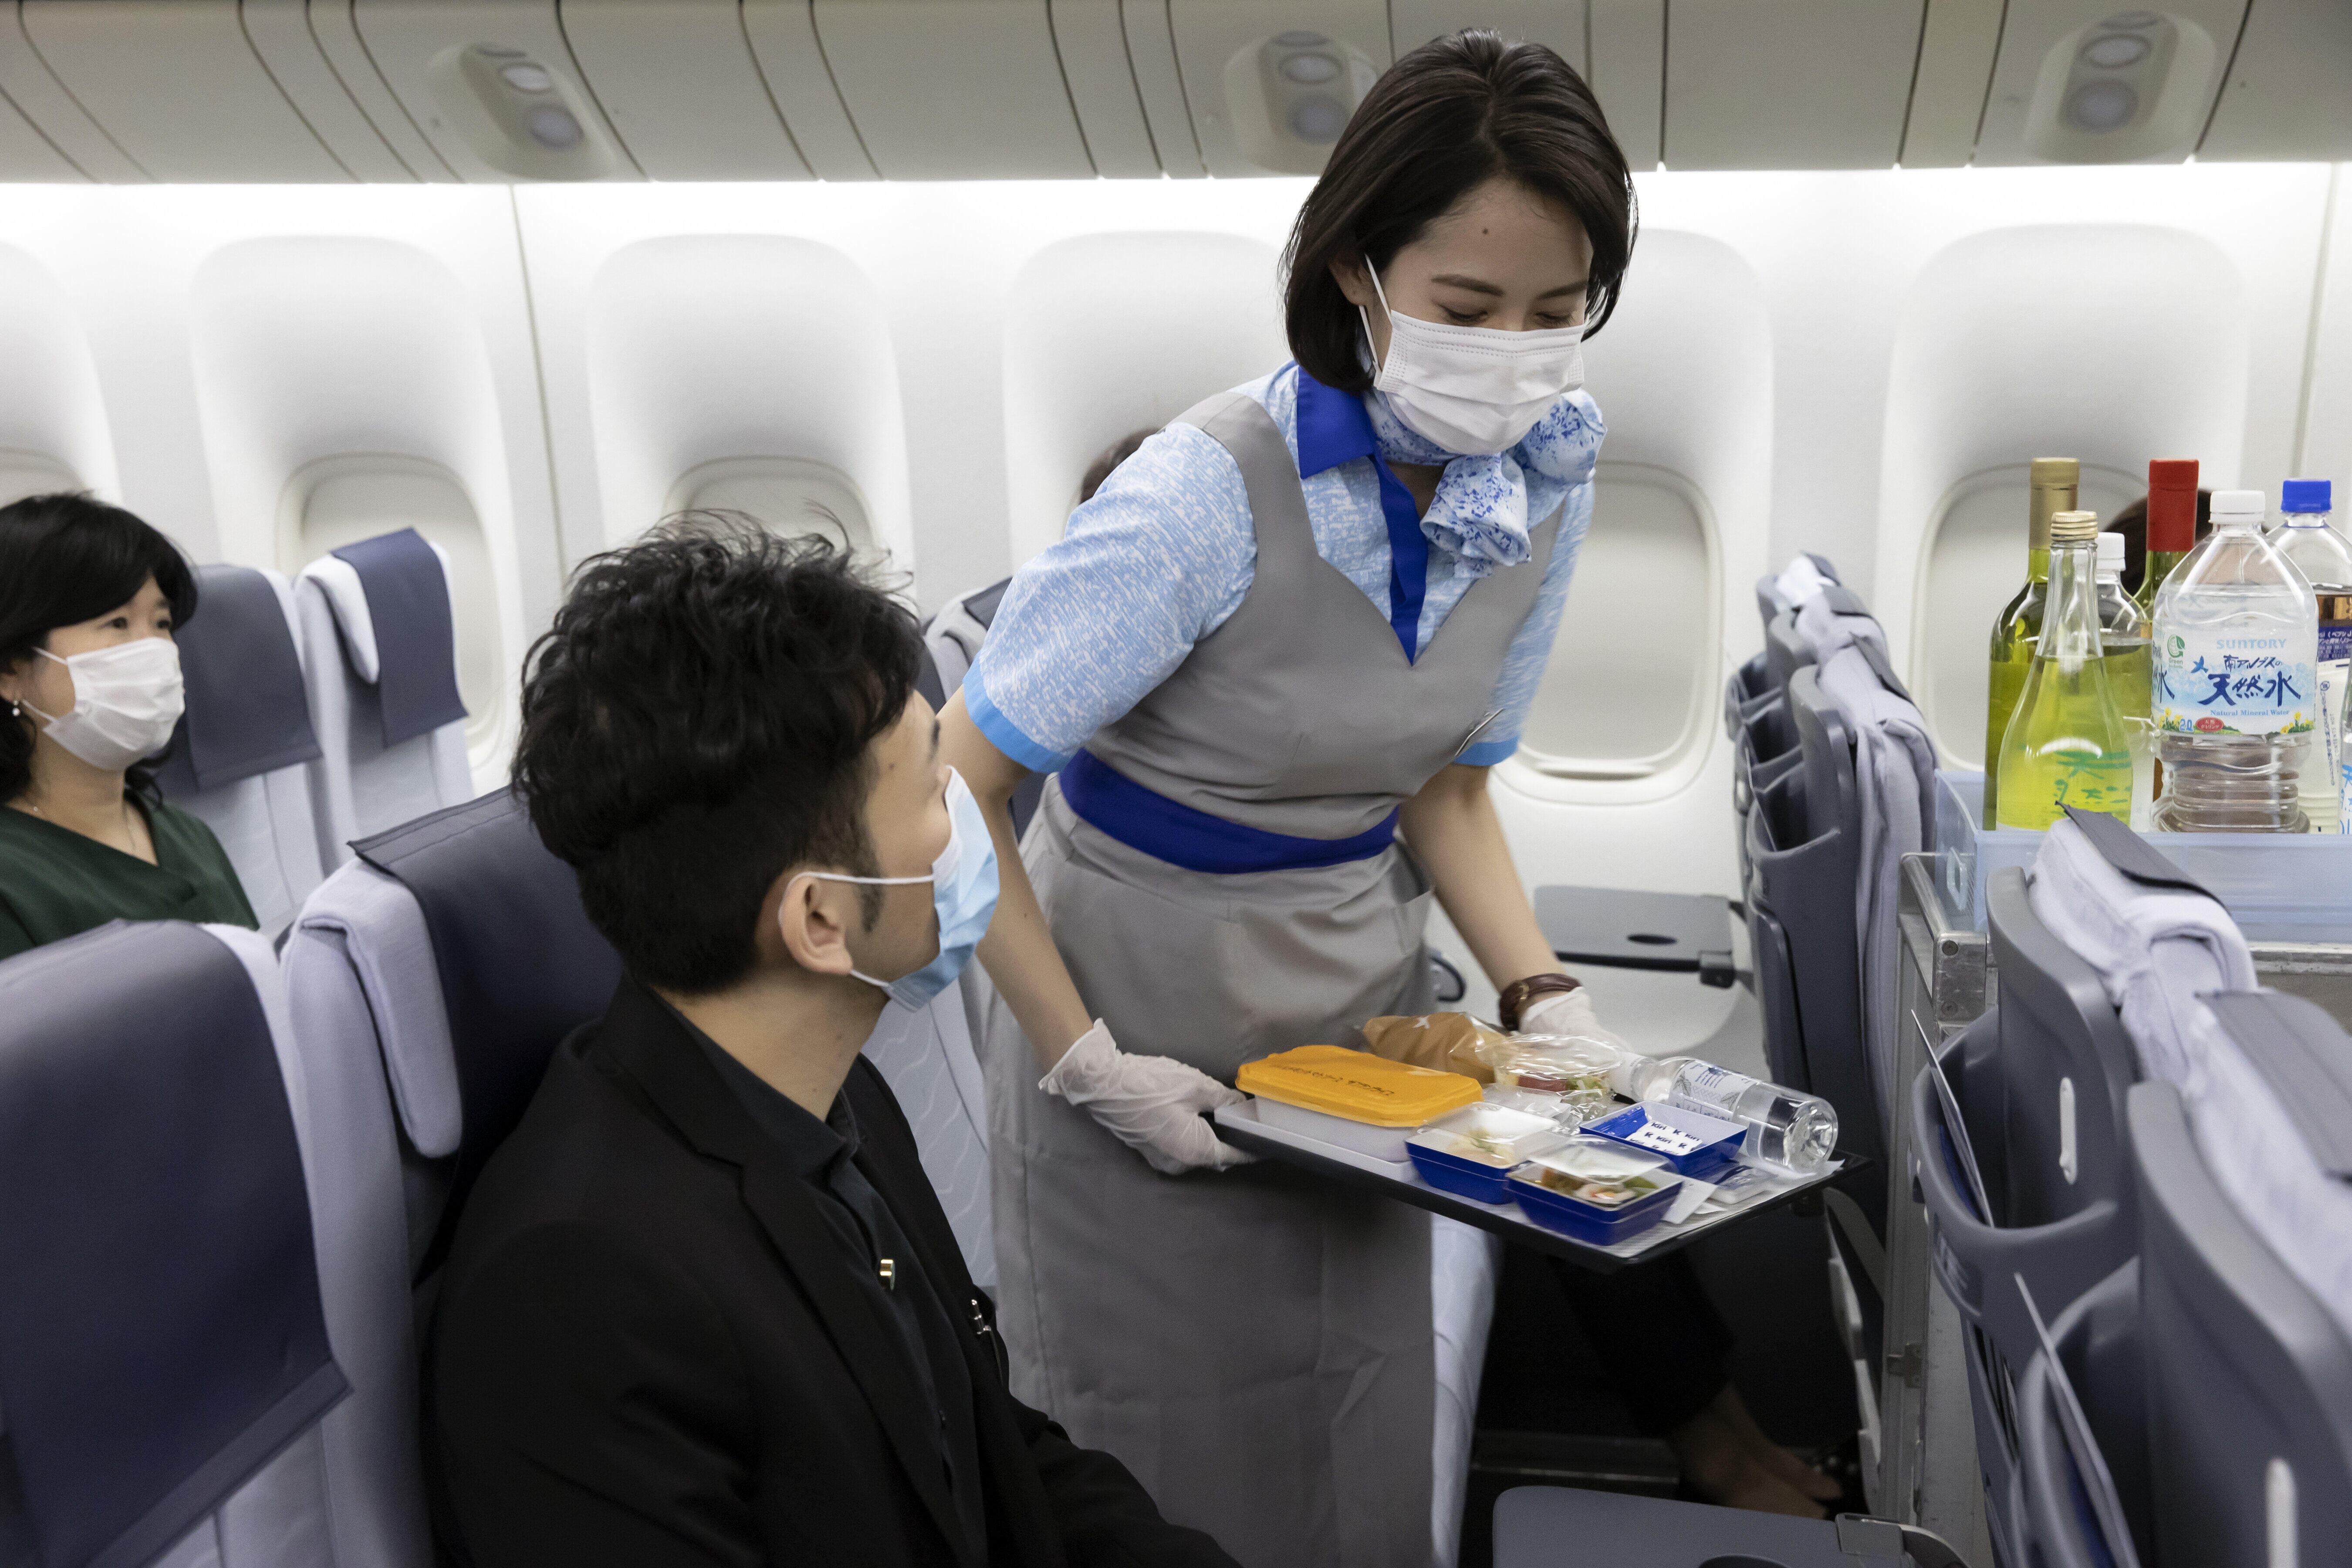 ANAの客室乗務員は機内でマスクとビニール手袋を着用し、機内食などをトレーに載せて提供している(ANA提供)